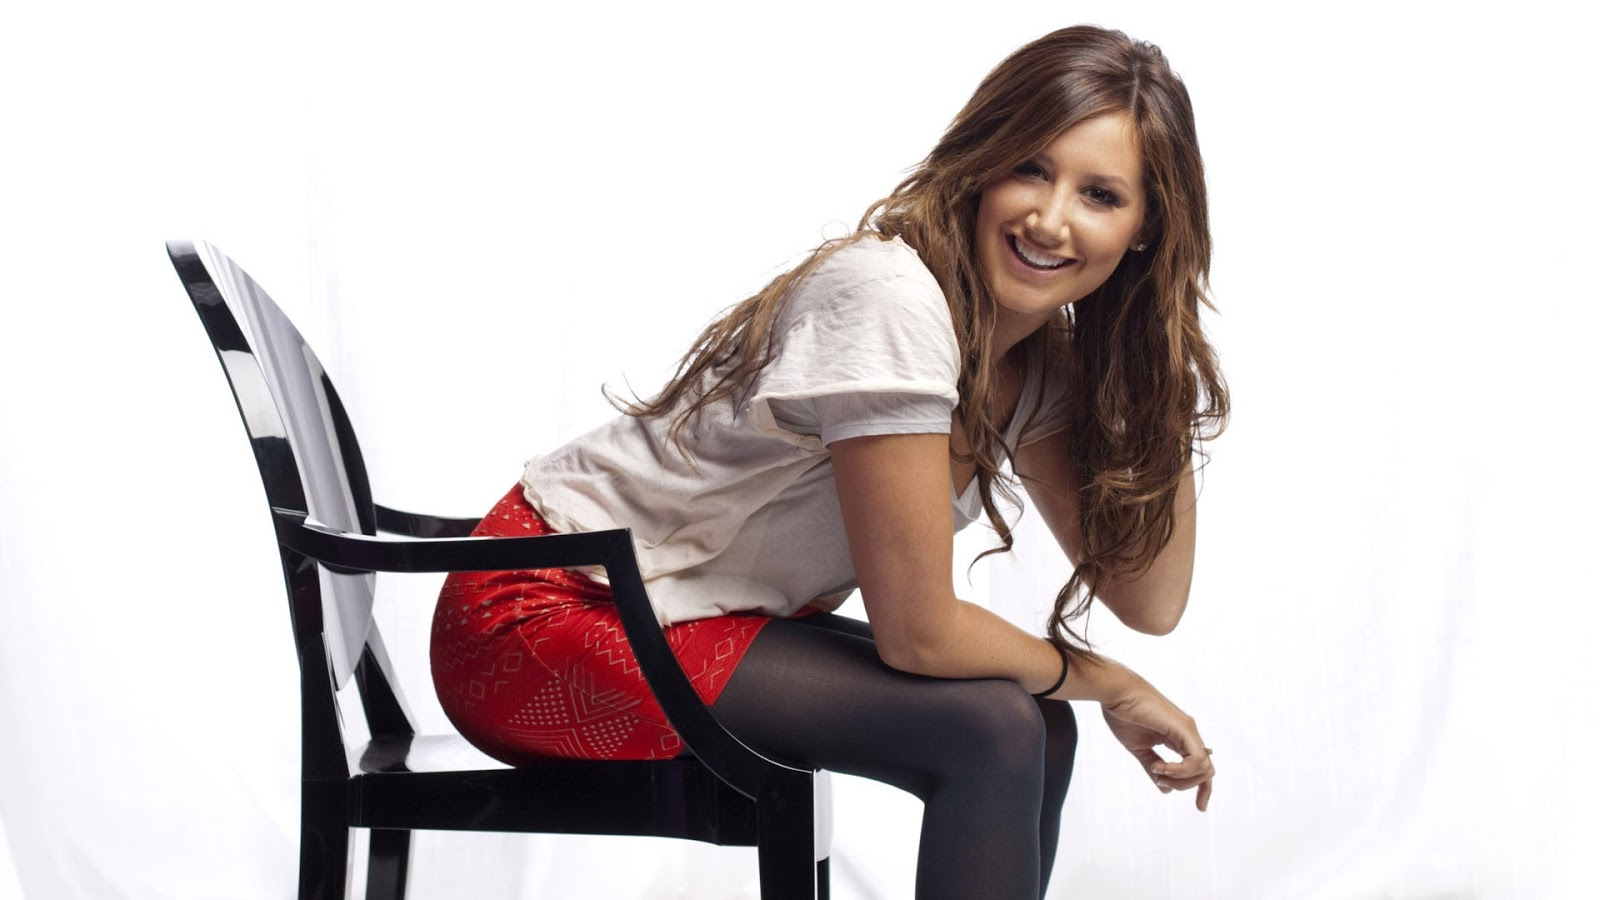 Ashley Tisdale Hot Desktop Wallpaper | HD Wallpapers (High Definition) | Celebrity HD Desktop ...